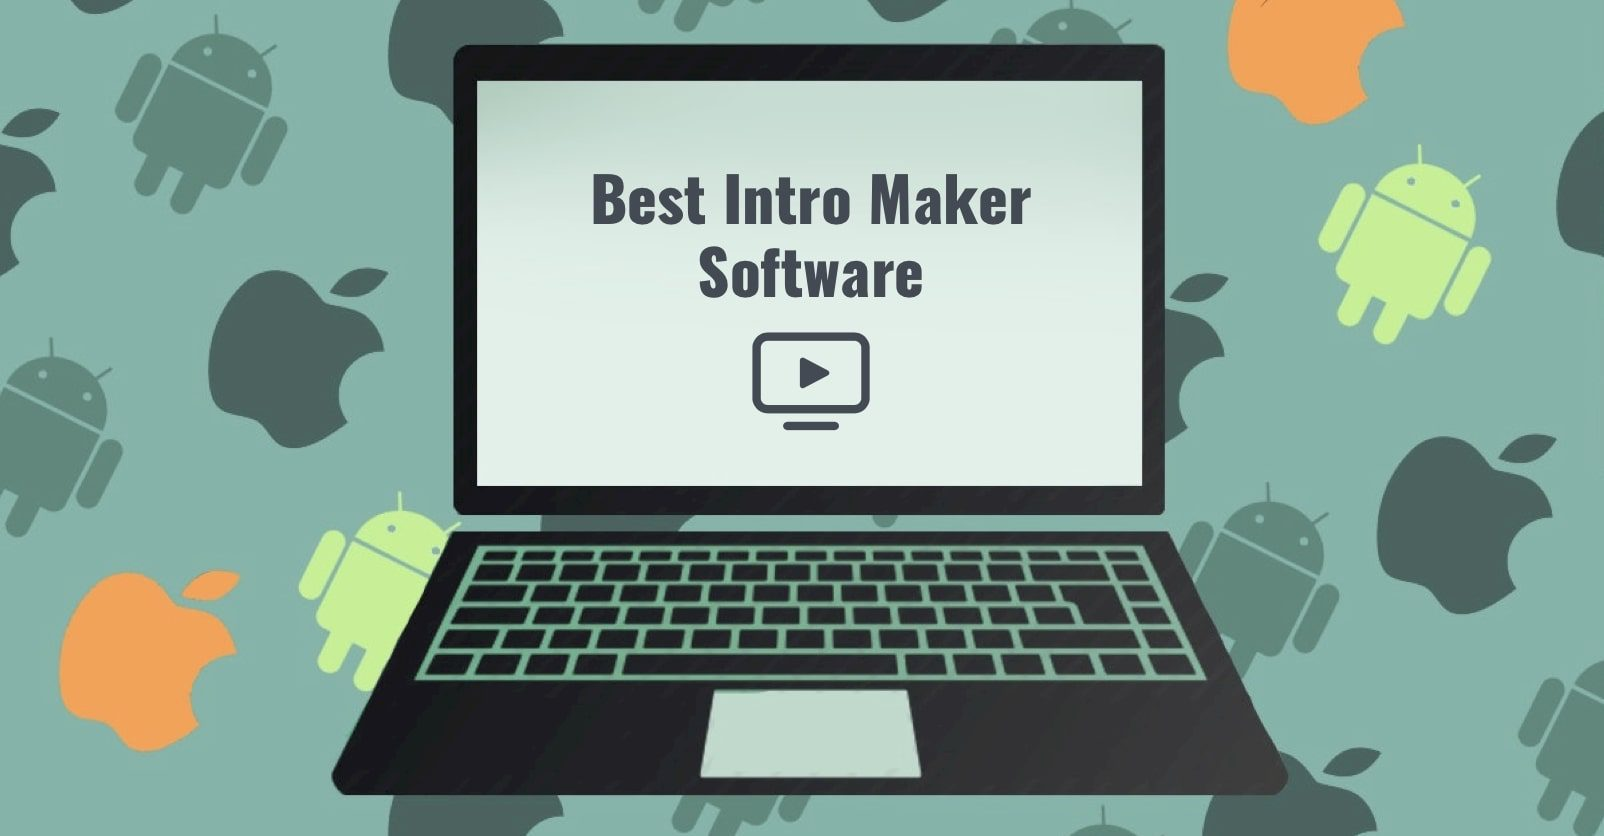 Best Intro Maker Software